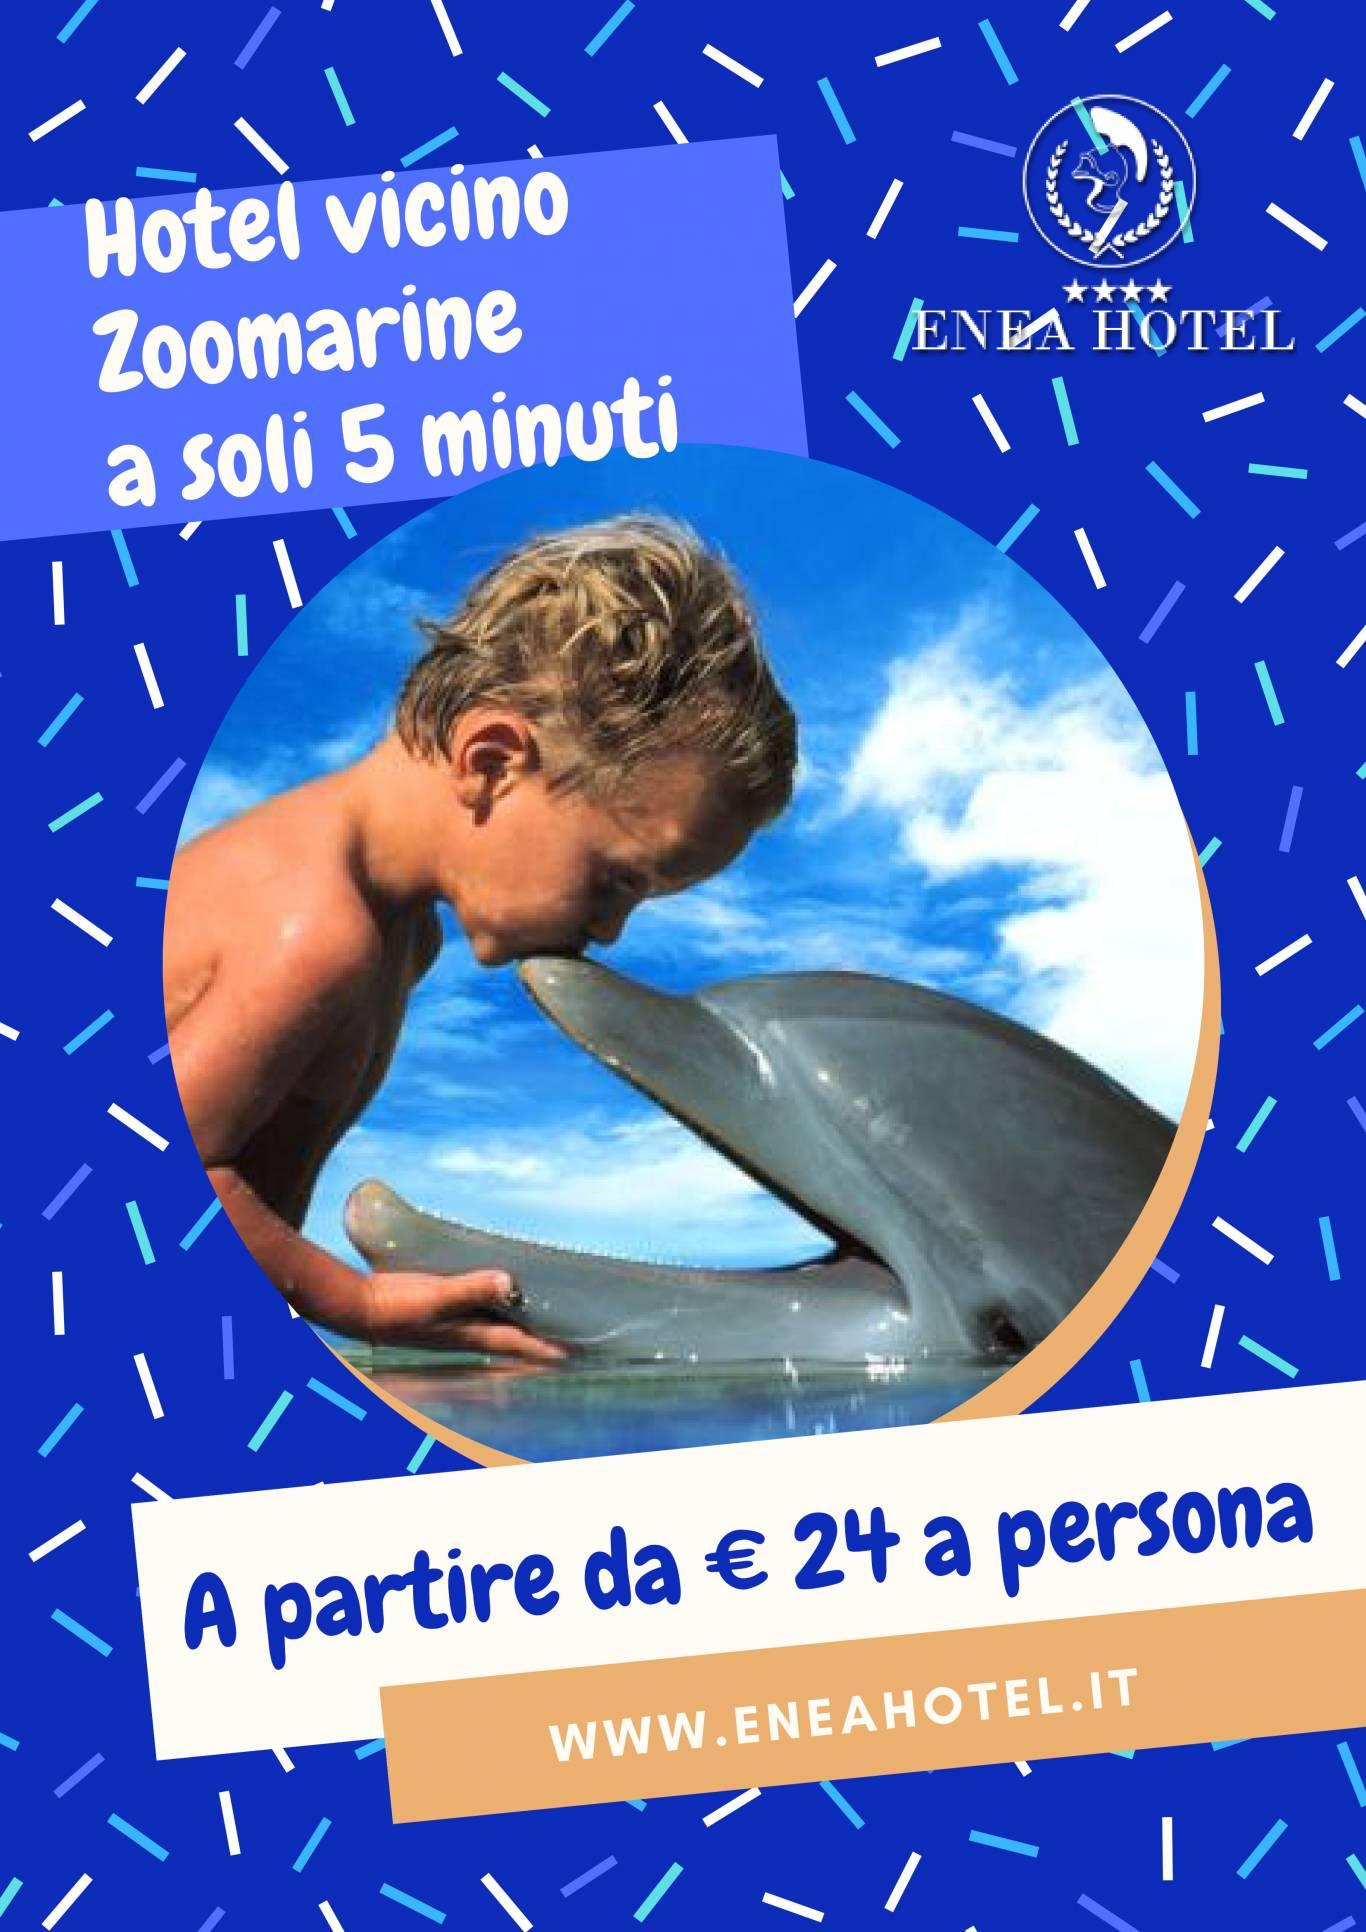 enea-hotel-offer-zoomarine-1